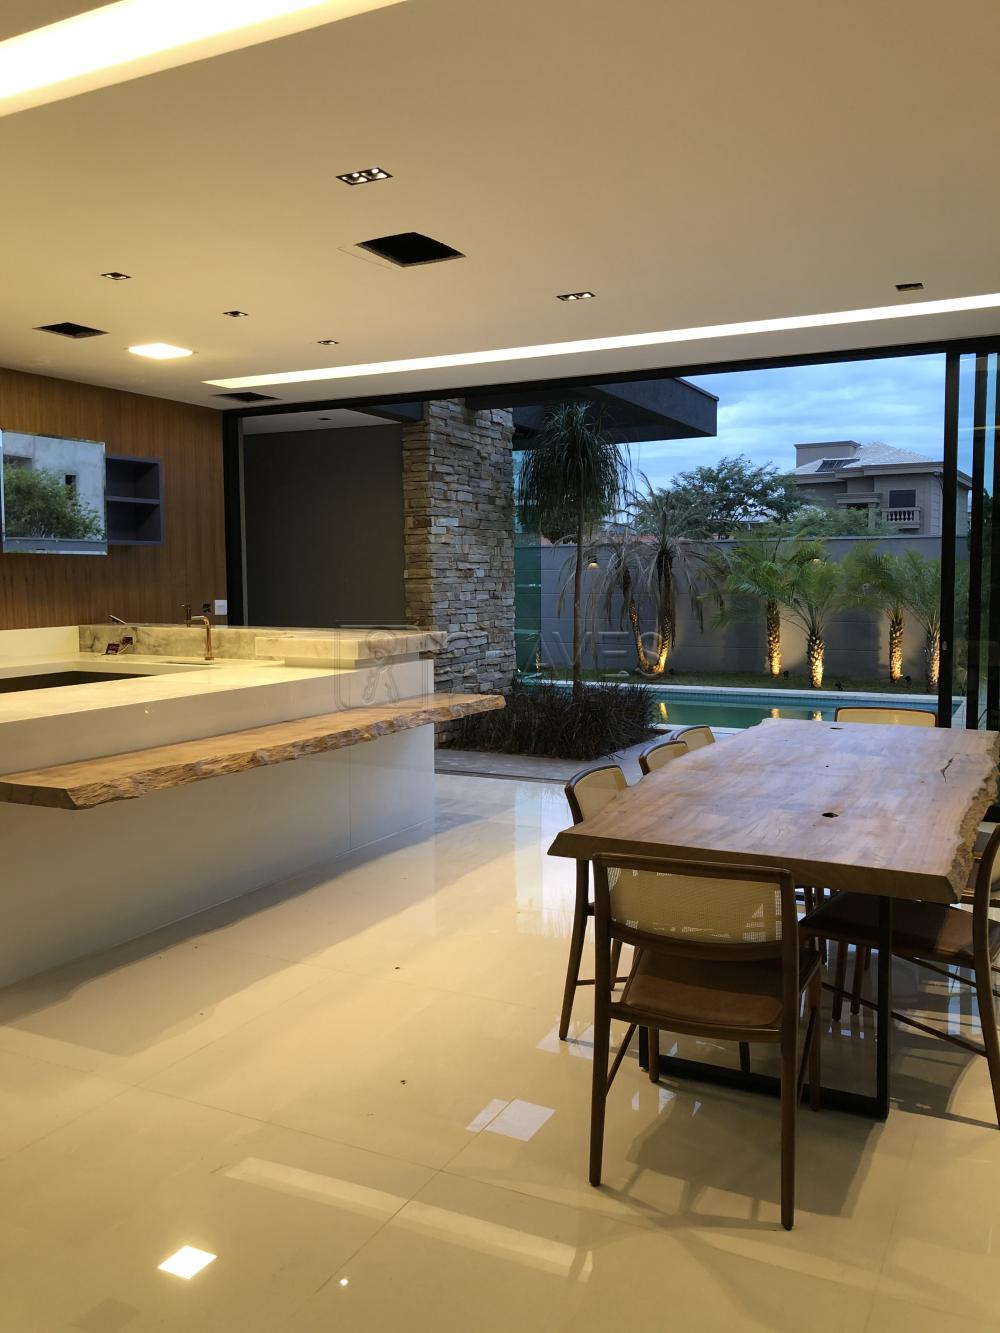 Ribeirao Preto Casa Venda R$2.300.000,00 Condominio R$478,00 4 Dormitorios 4 Suites Area do terreno 495.00m2 Area construida 400.00m2